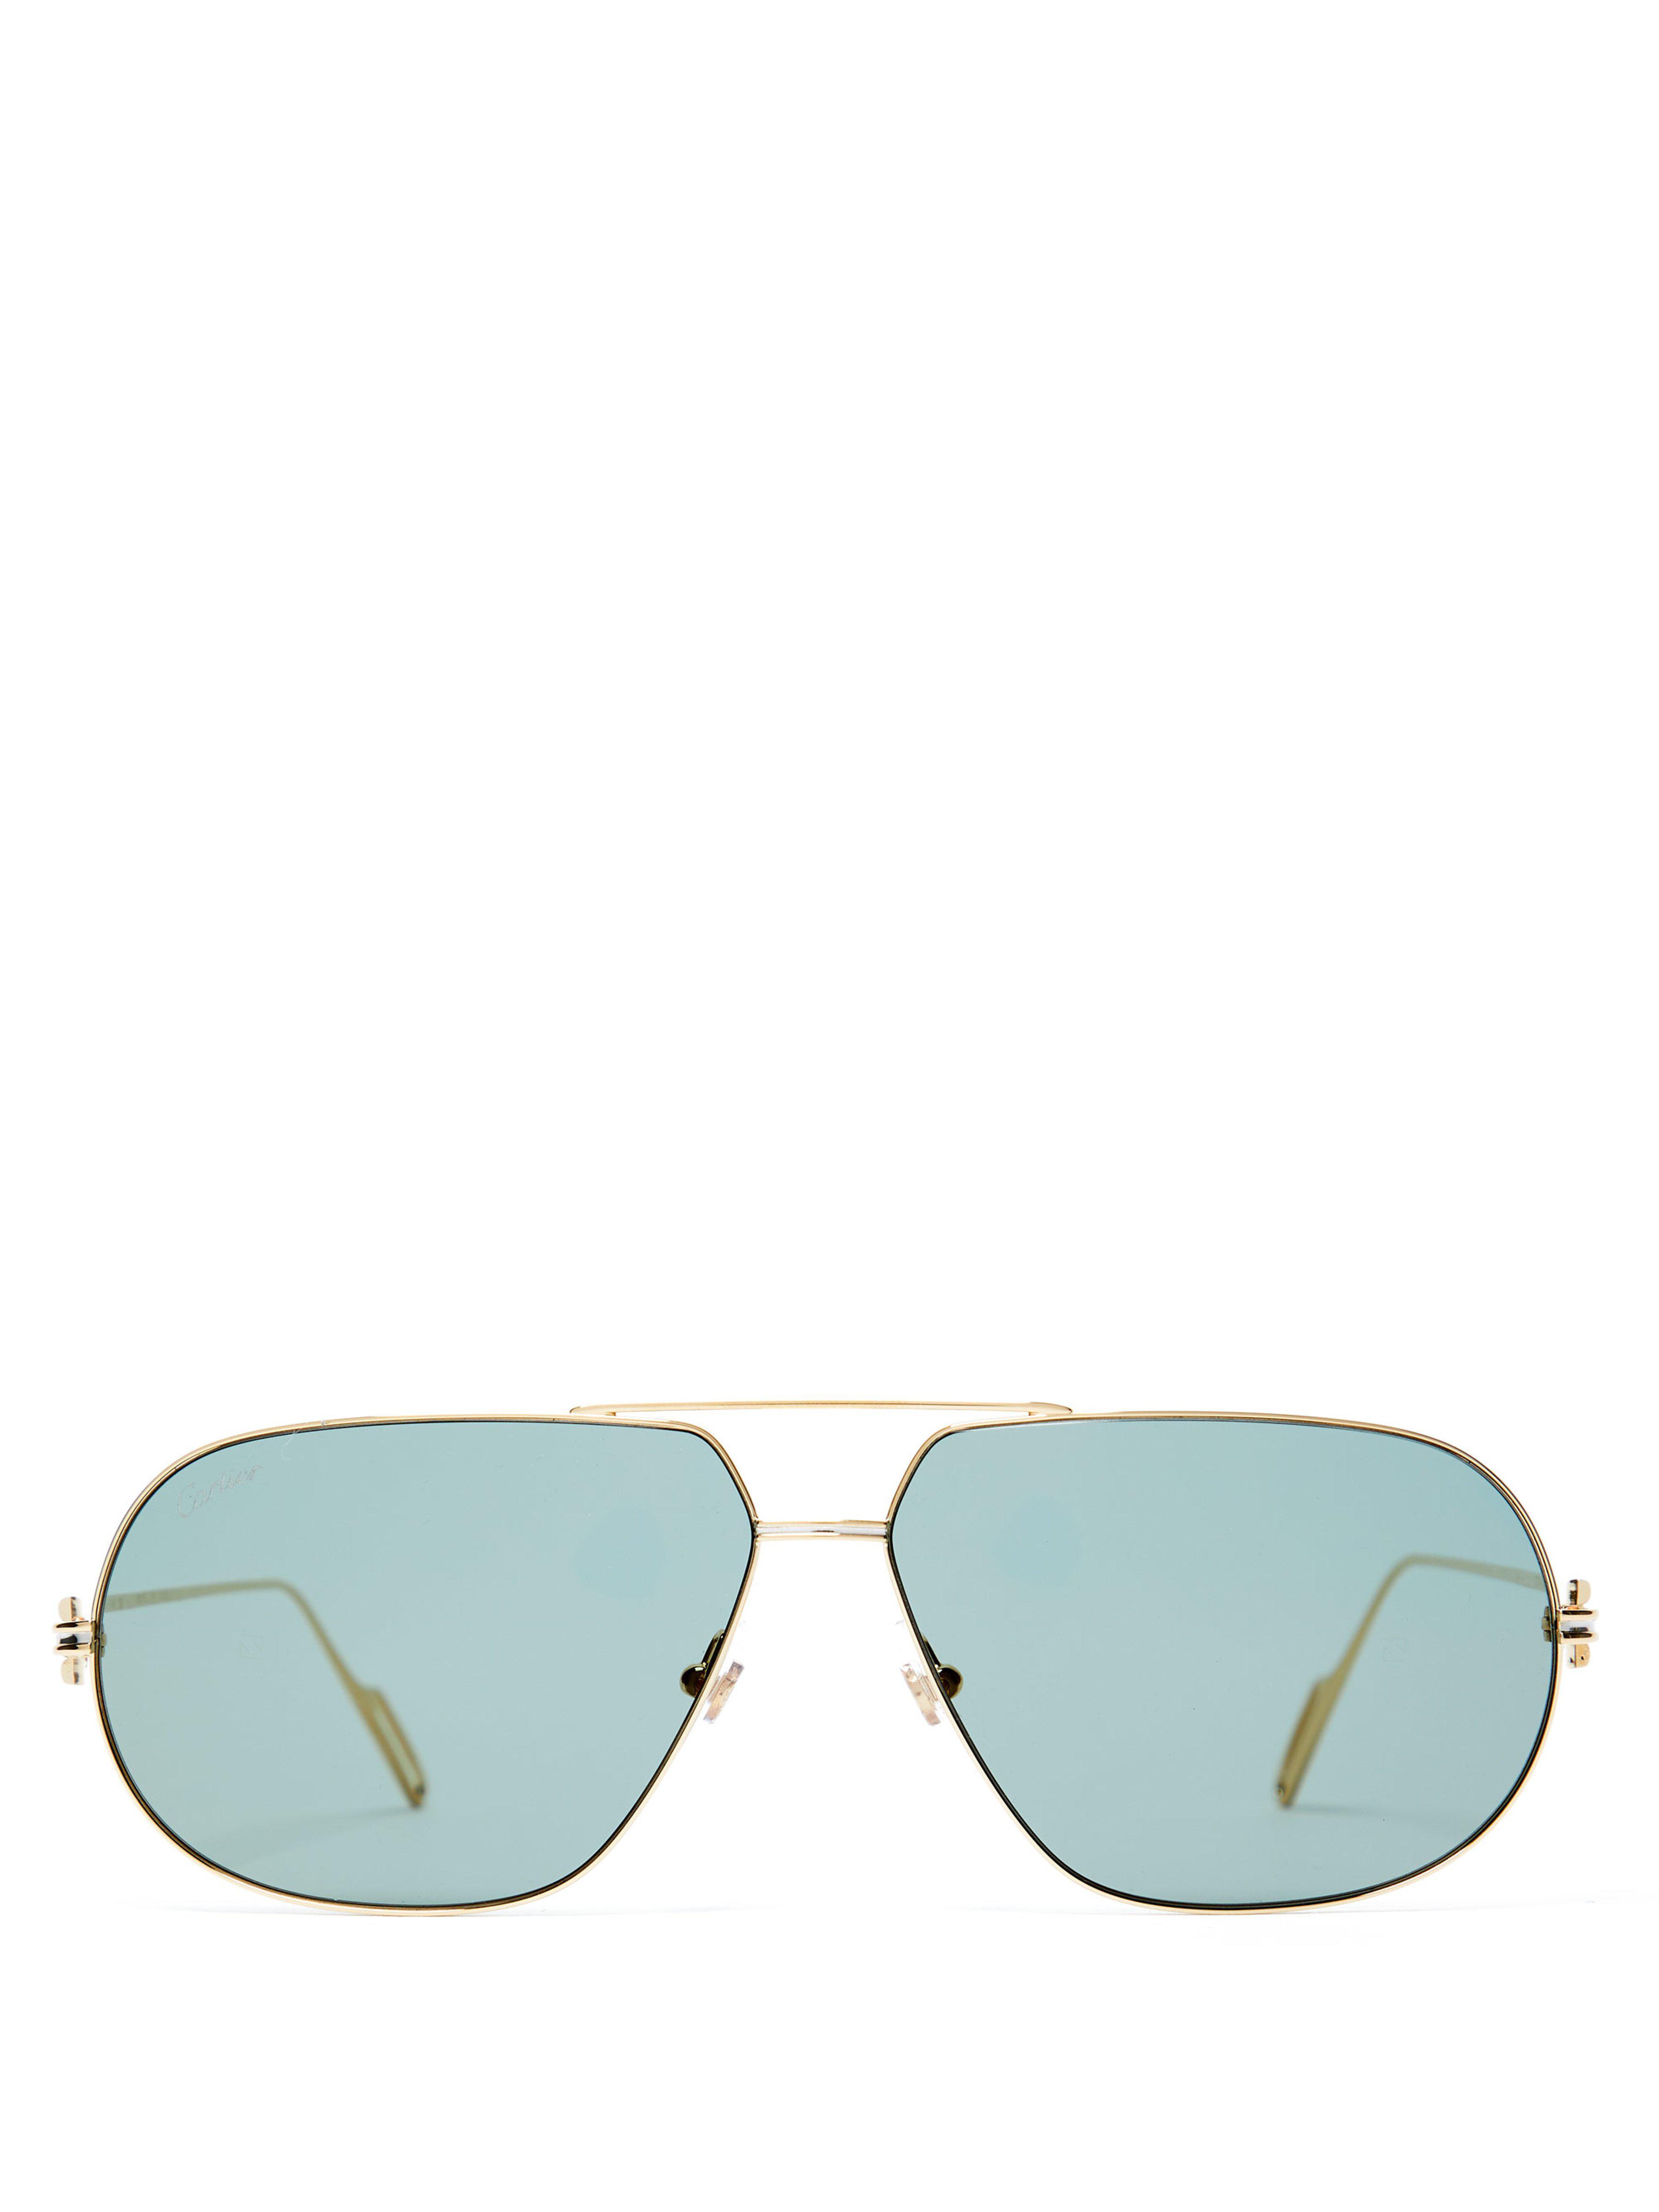 96f25073d76 Cartier Première De Cartier Aviator Frame Sunglasses in Metallic for ...